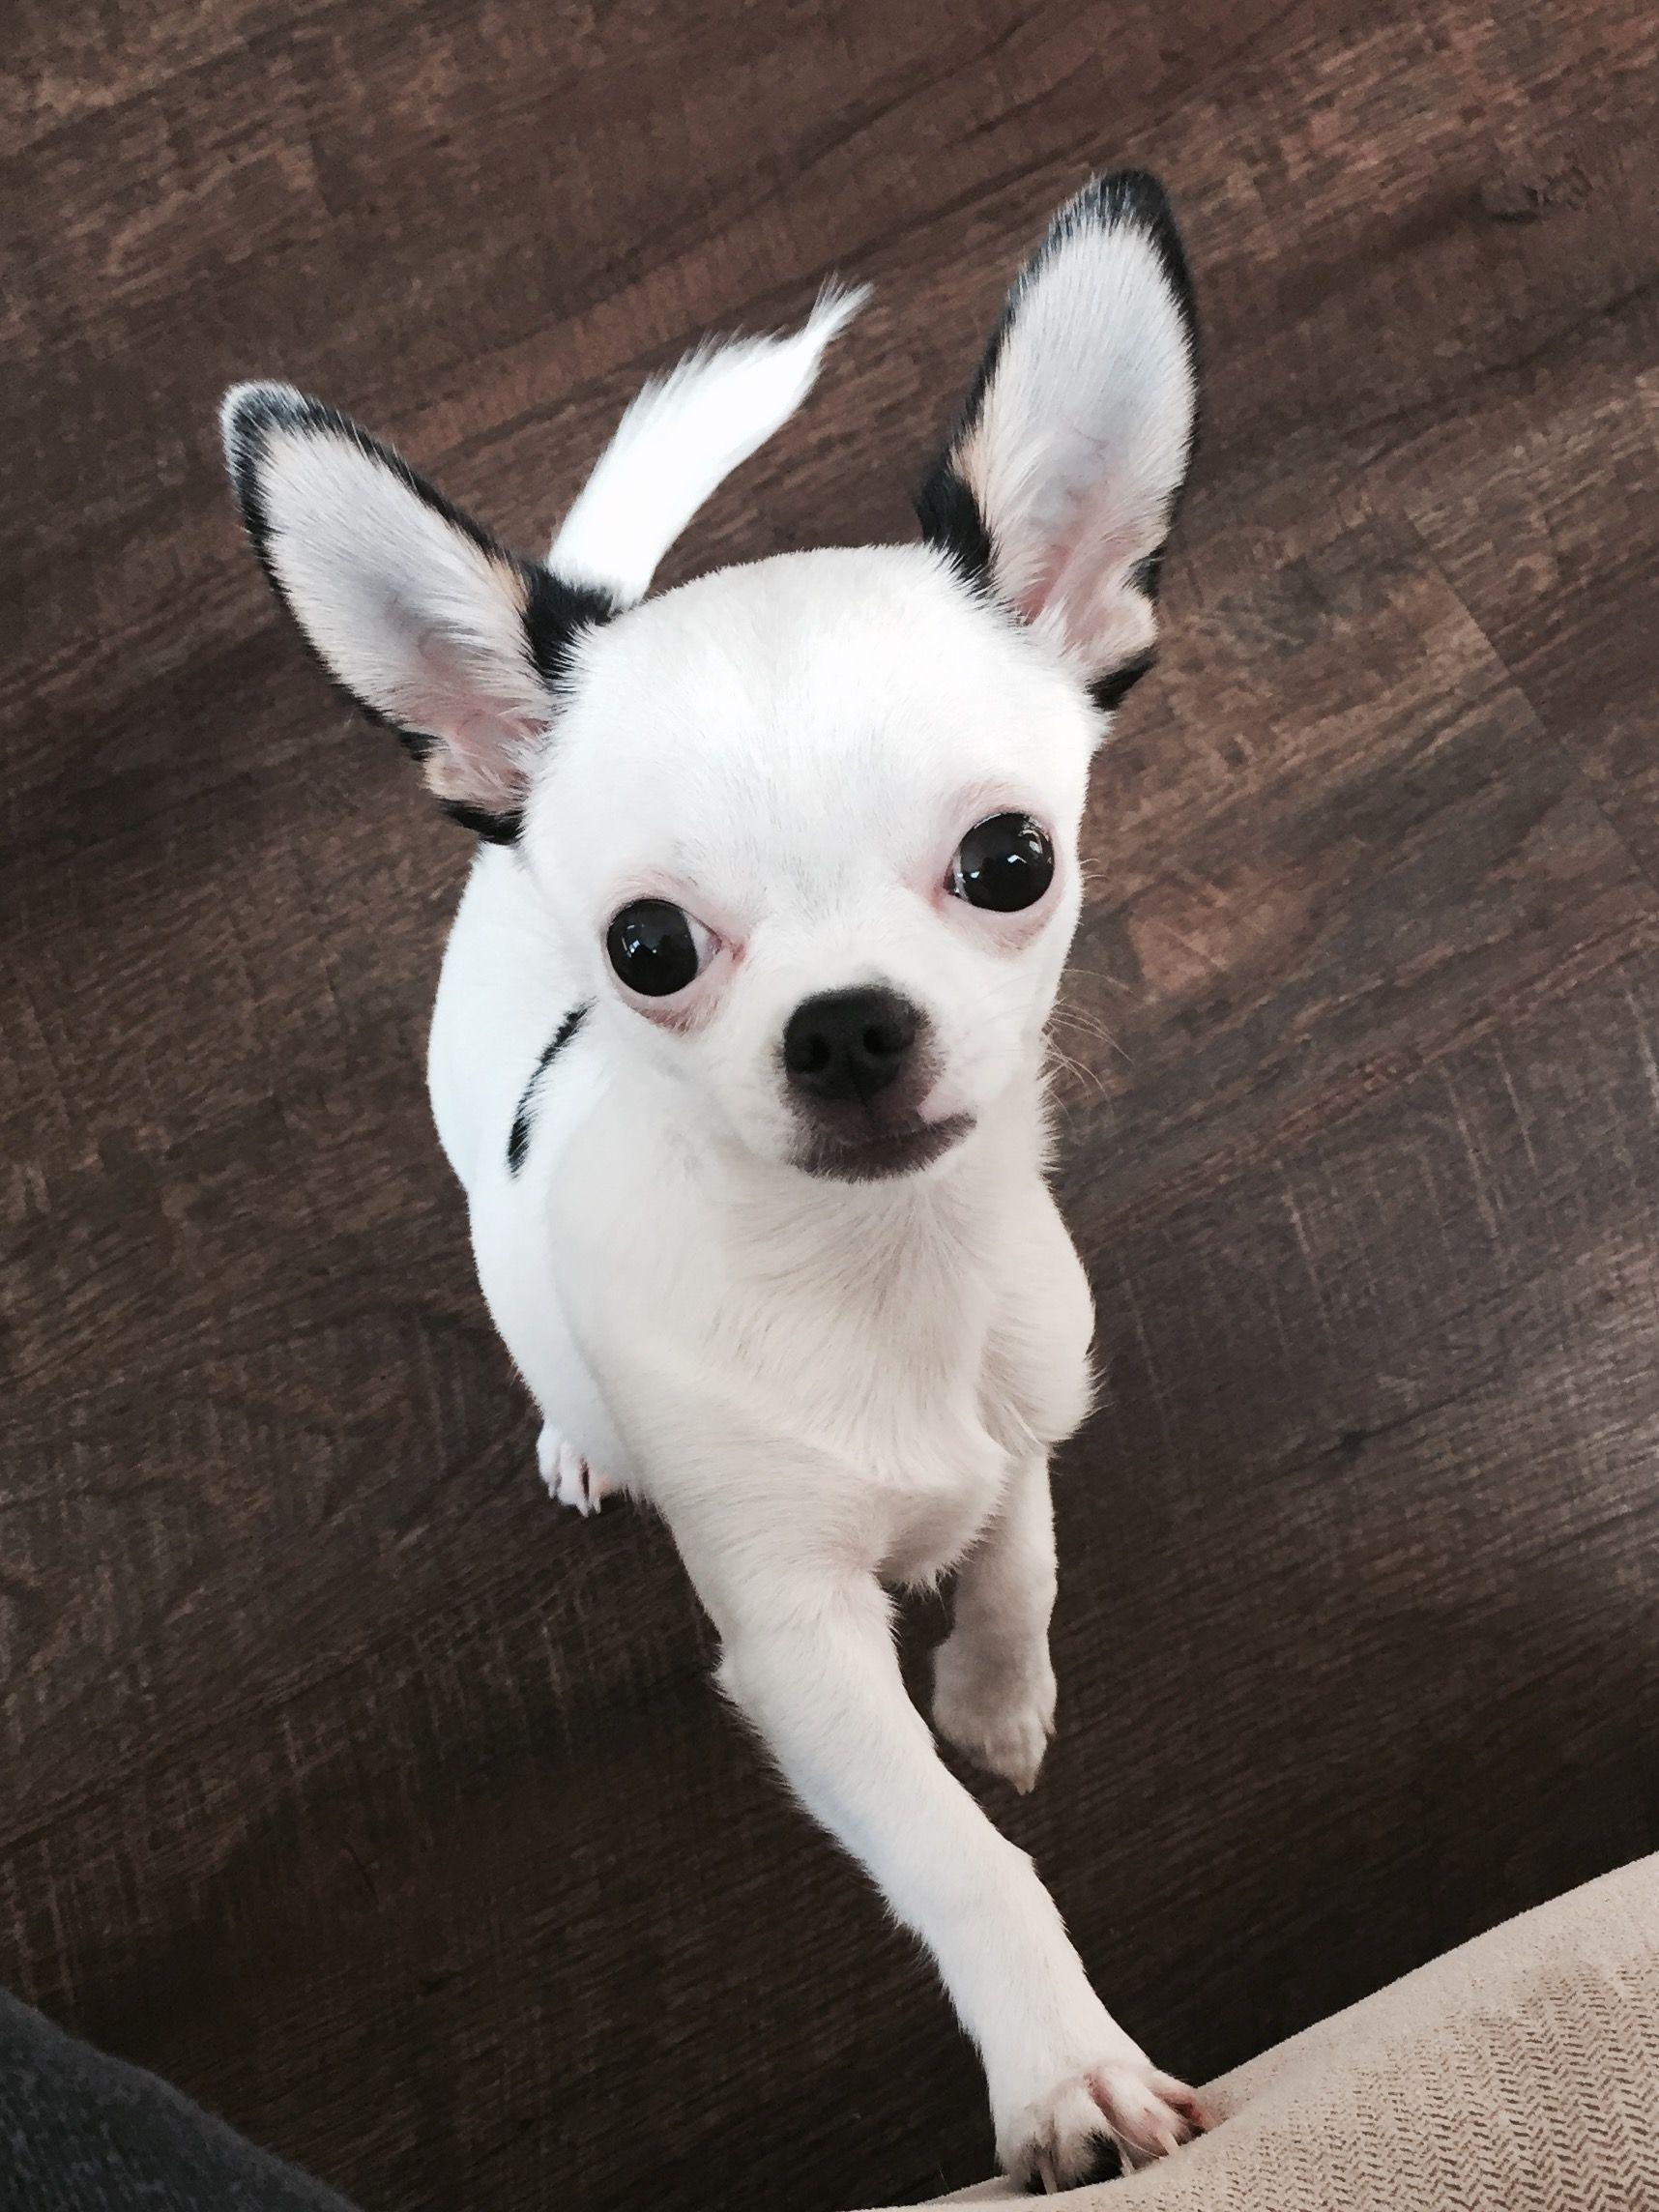 My Precious Chihuahua Will